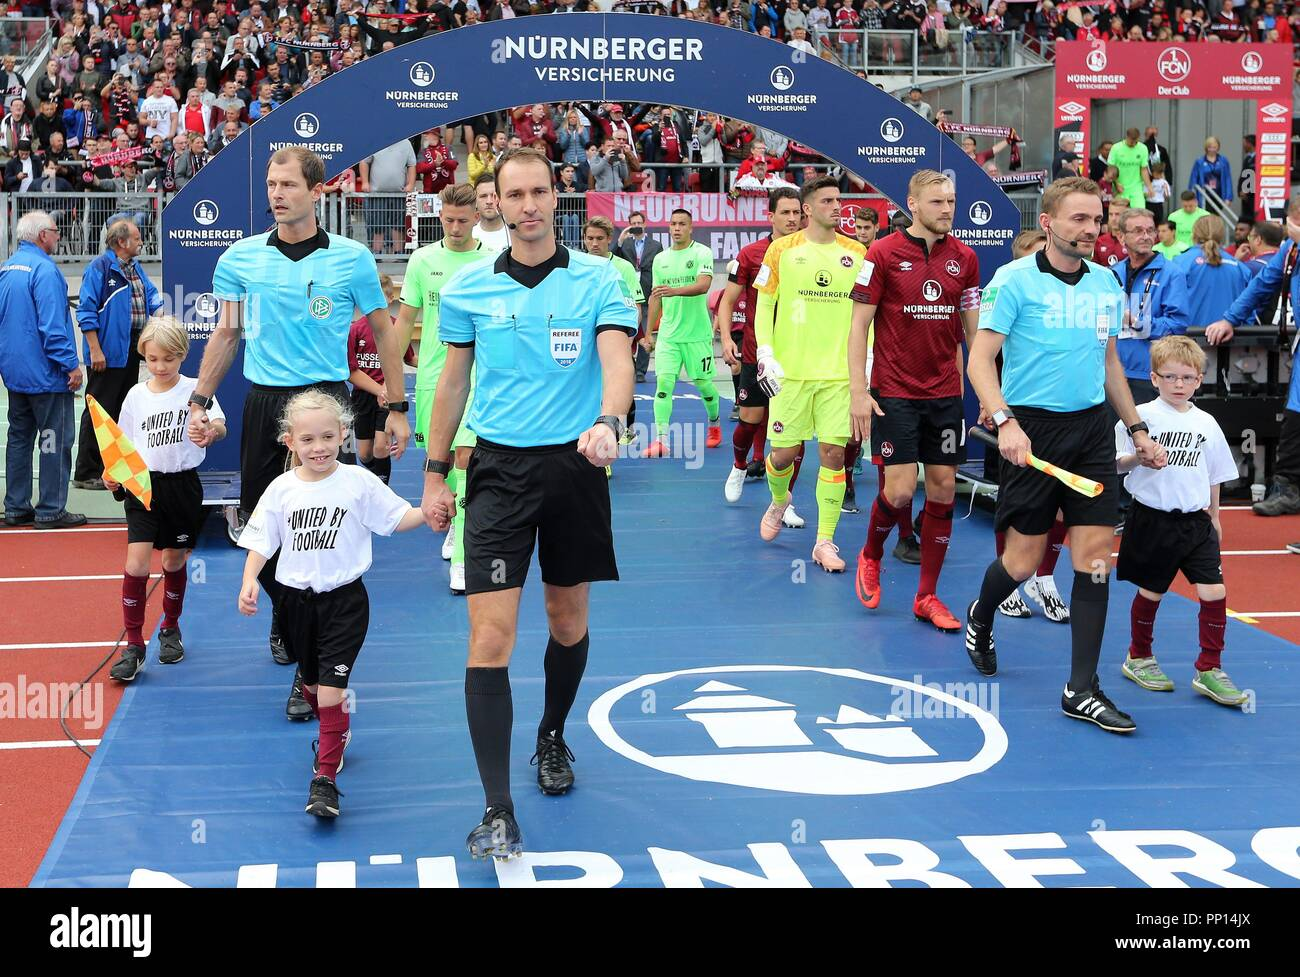 firo: 22.09.2018 Fuvuball, Football: 1.Bundesliga 1.FC Nvºrnberg - Hanover 96 2: 0, Bastian Dankert, Einlauf, Hinterleger, General, | usage worldwide Stock Photo